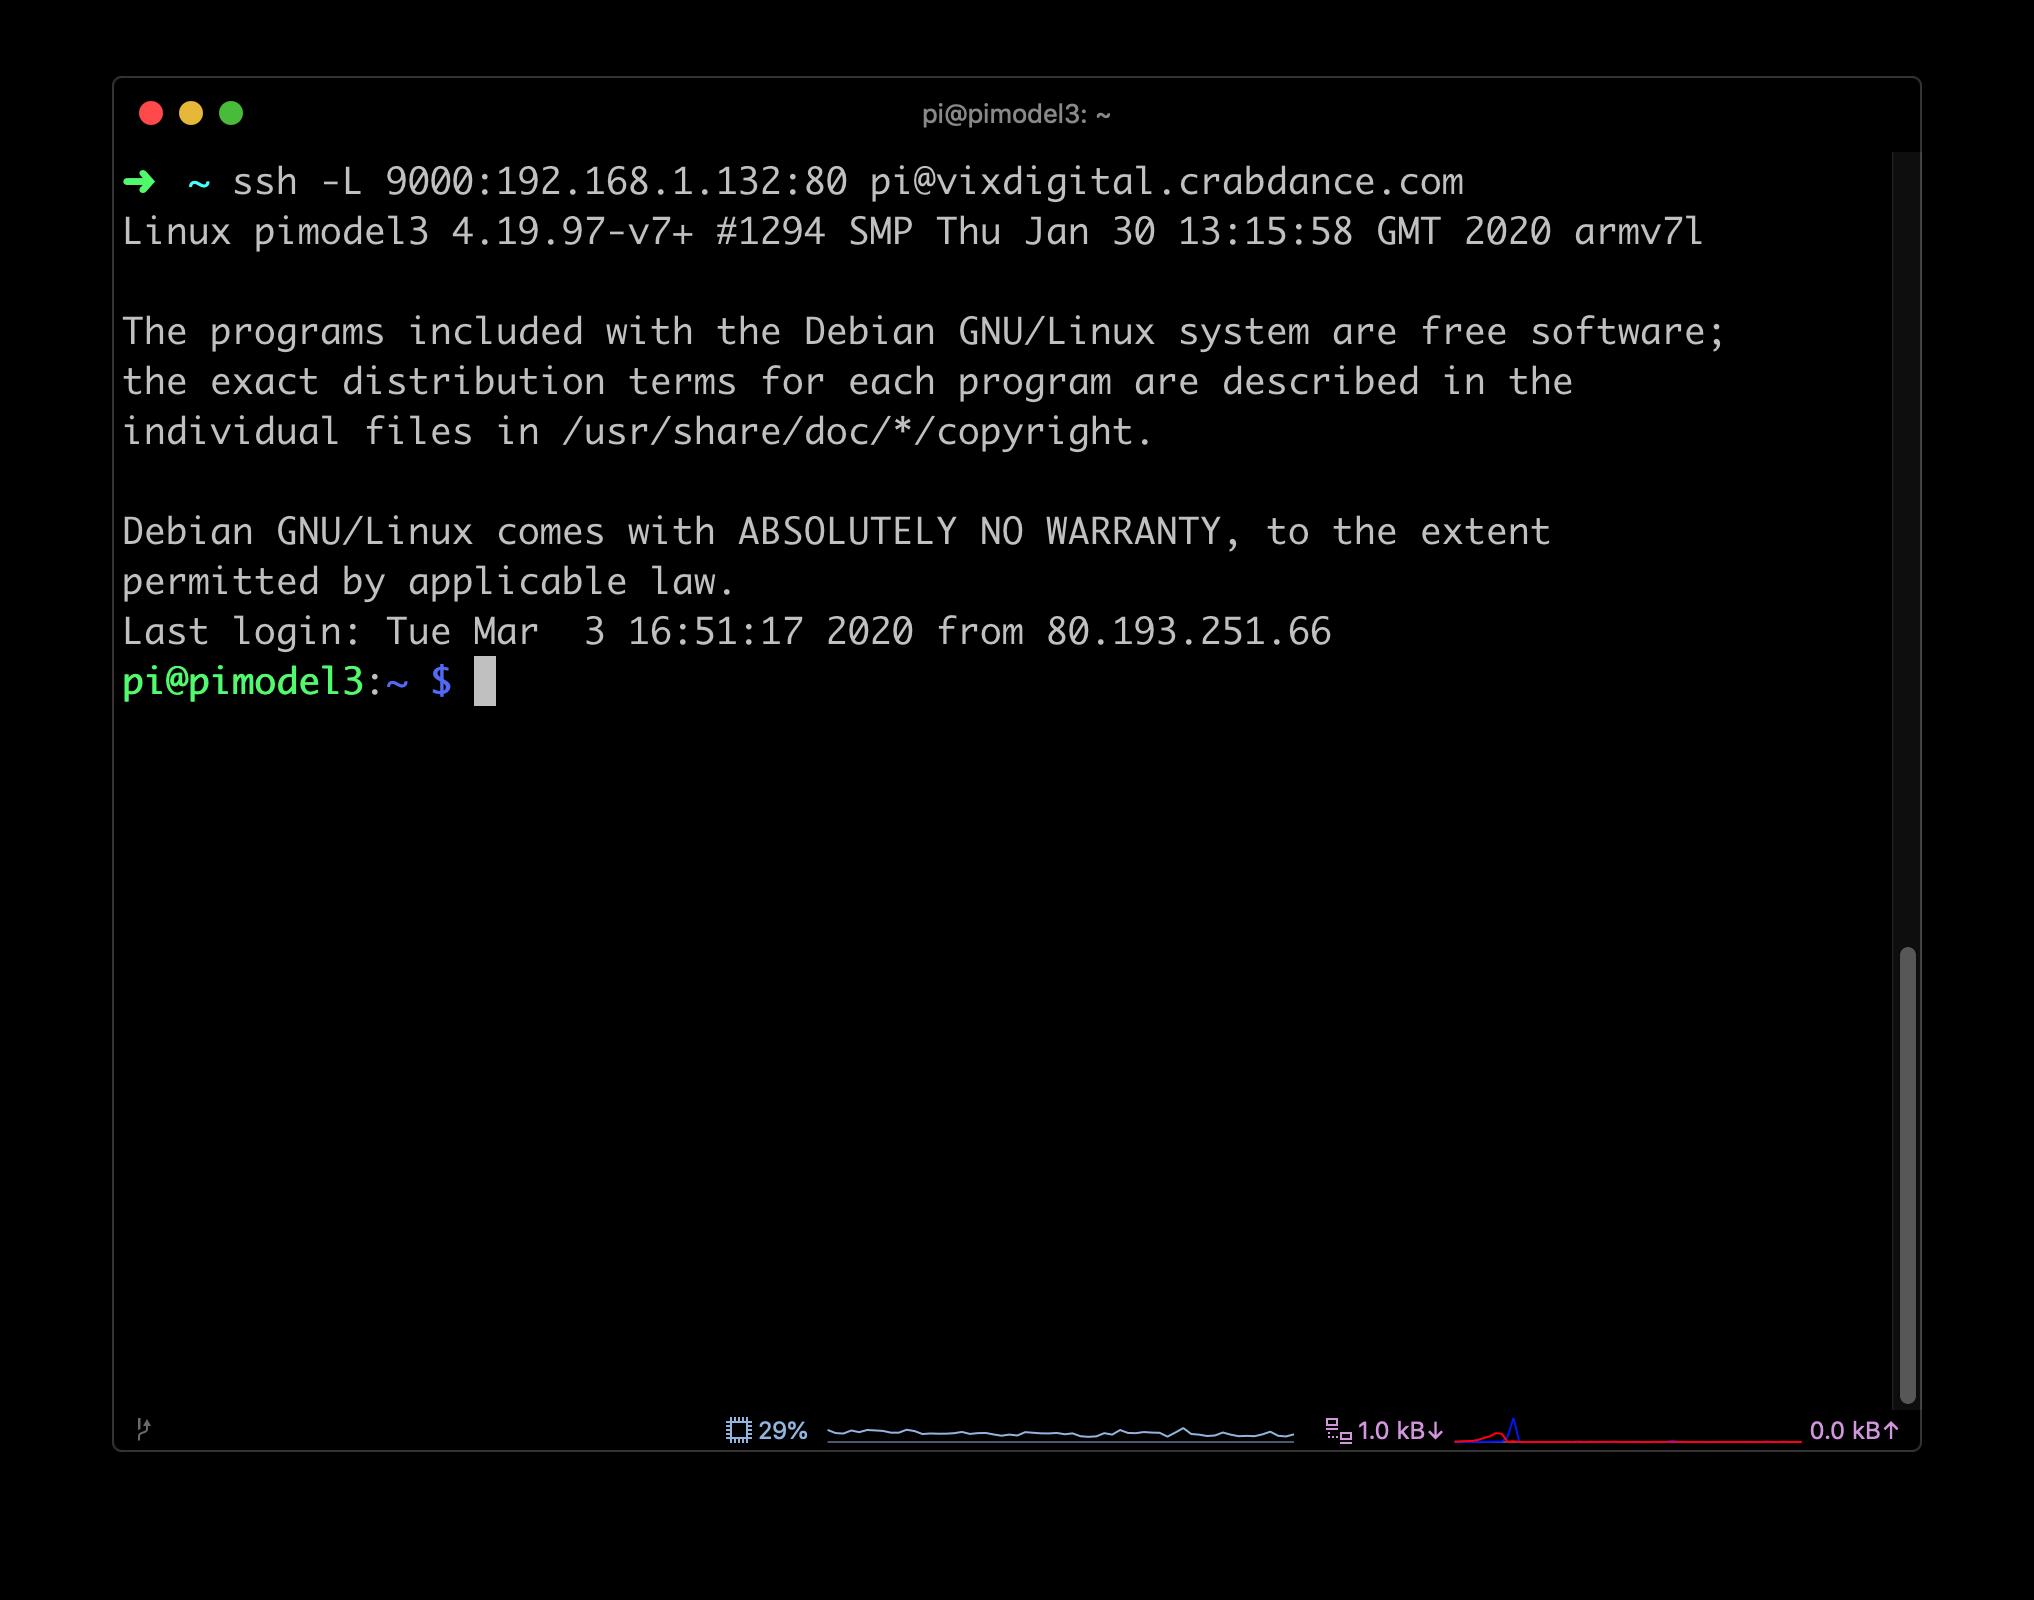 https://s3-us-west-2.amazonaws.com/secure.notion-static.com/8eae3c47-e073-46f1-aeaf-6e82806b867d/Screenshot_2020-03-03_at_16.57.21.png